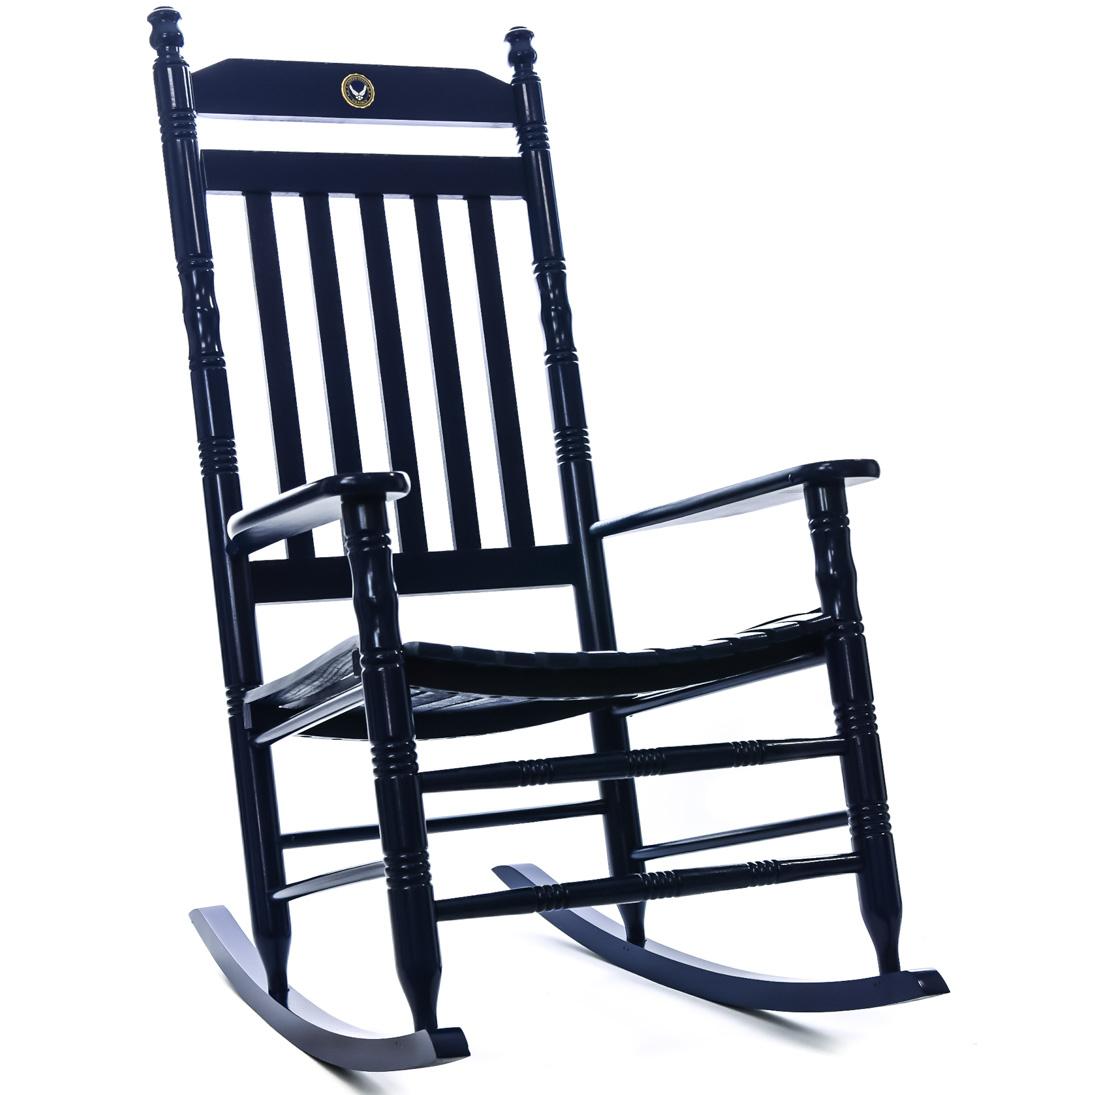 Penn State Rocking Chair  sc 1 st  Zelfaanhetwerk & Penn State Rocking Chair | Zelfaanhetwerk